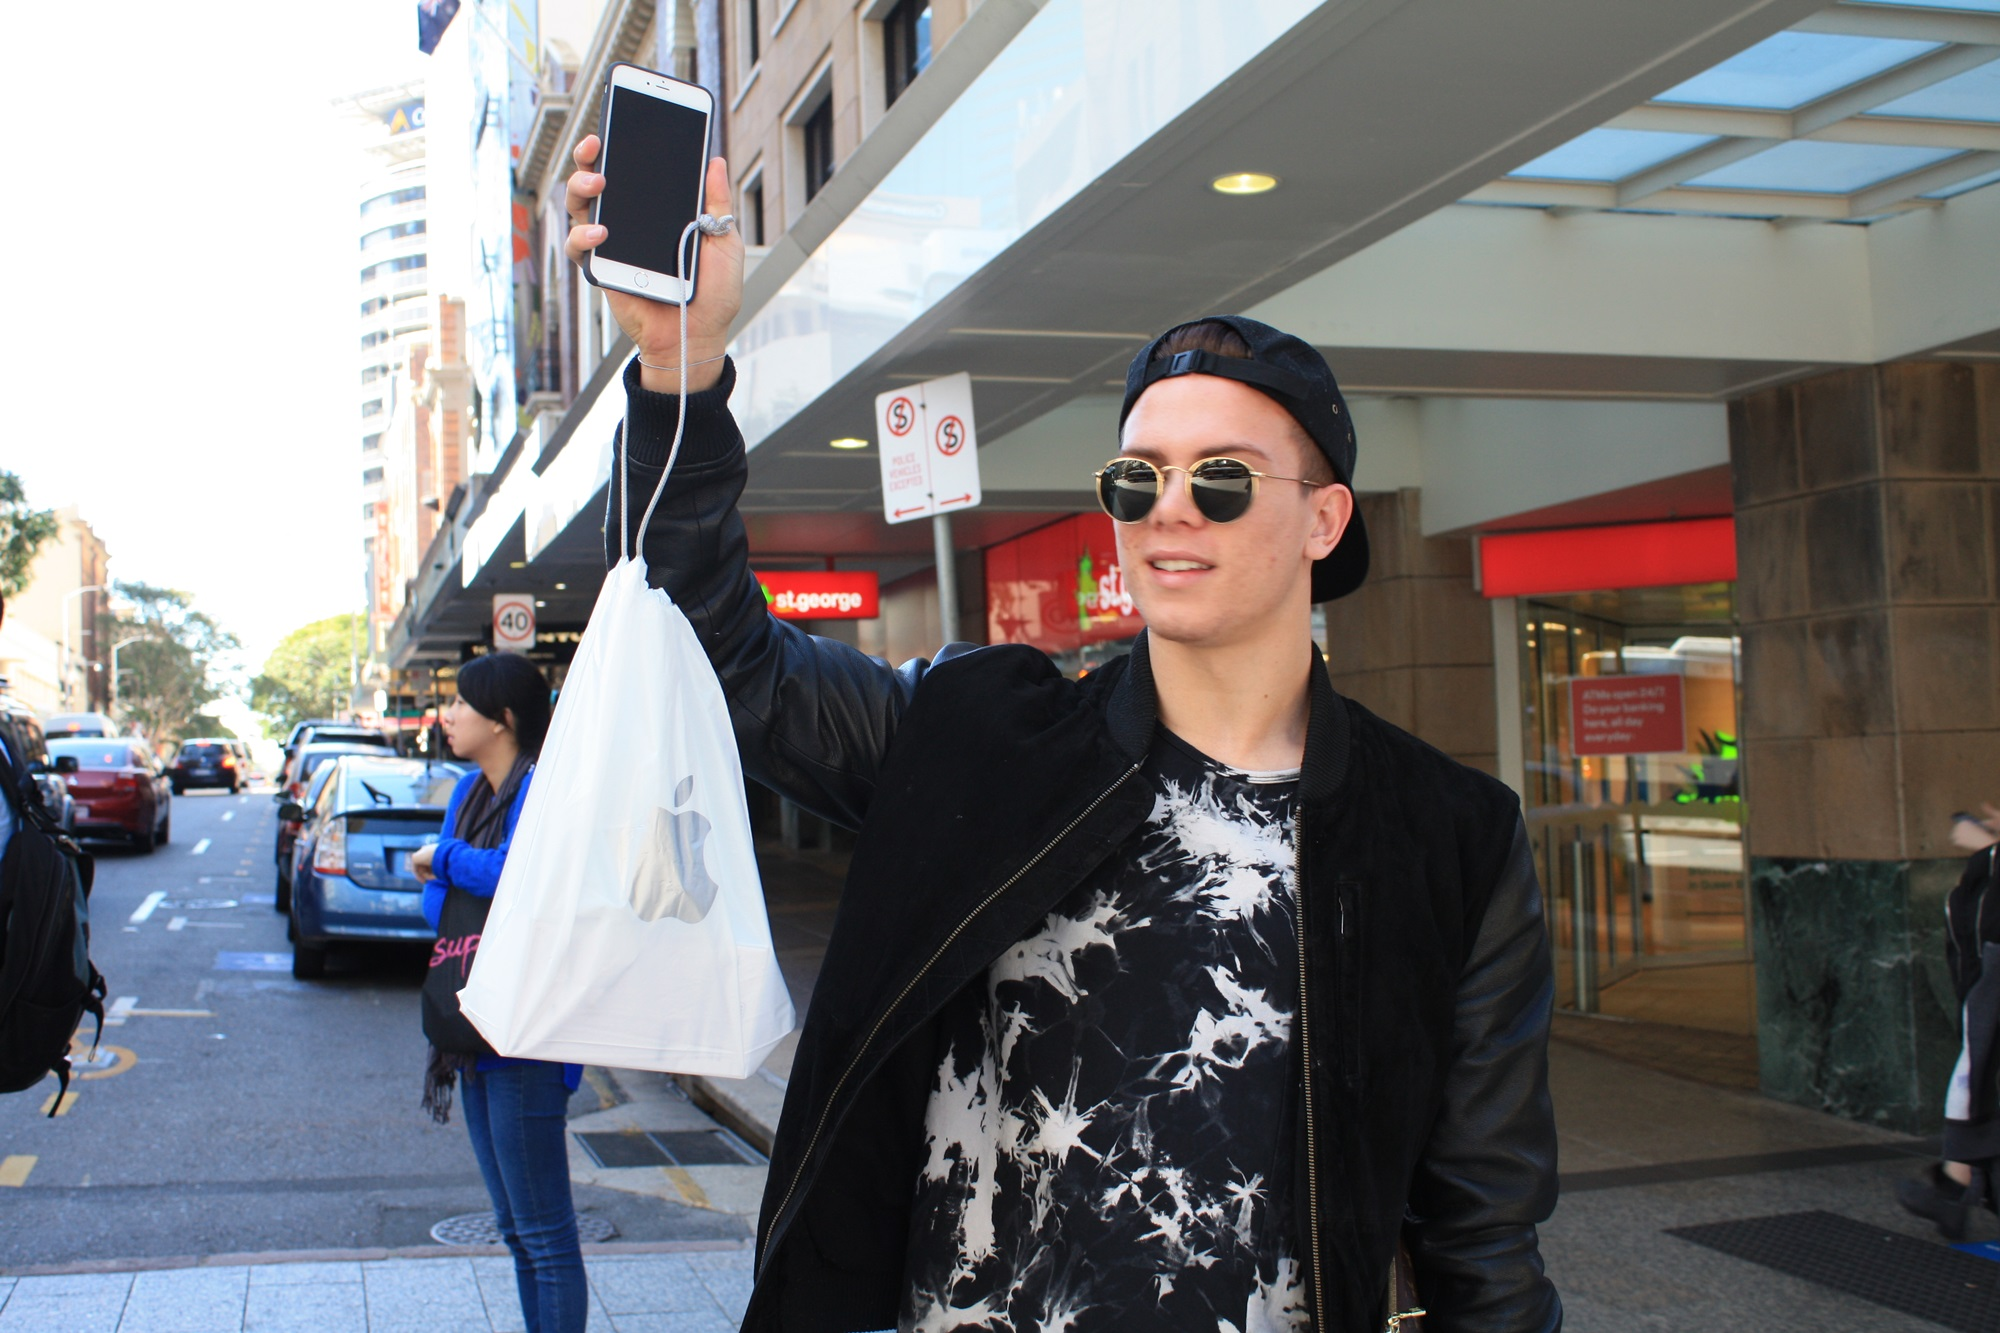 Lesly Lotha_Newzulu Australia_iphone 6 launch_Brisbane_Australia 01